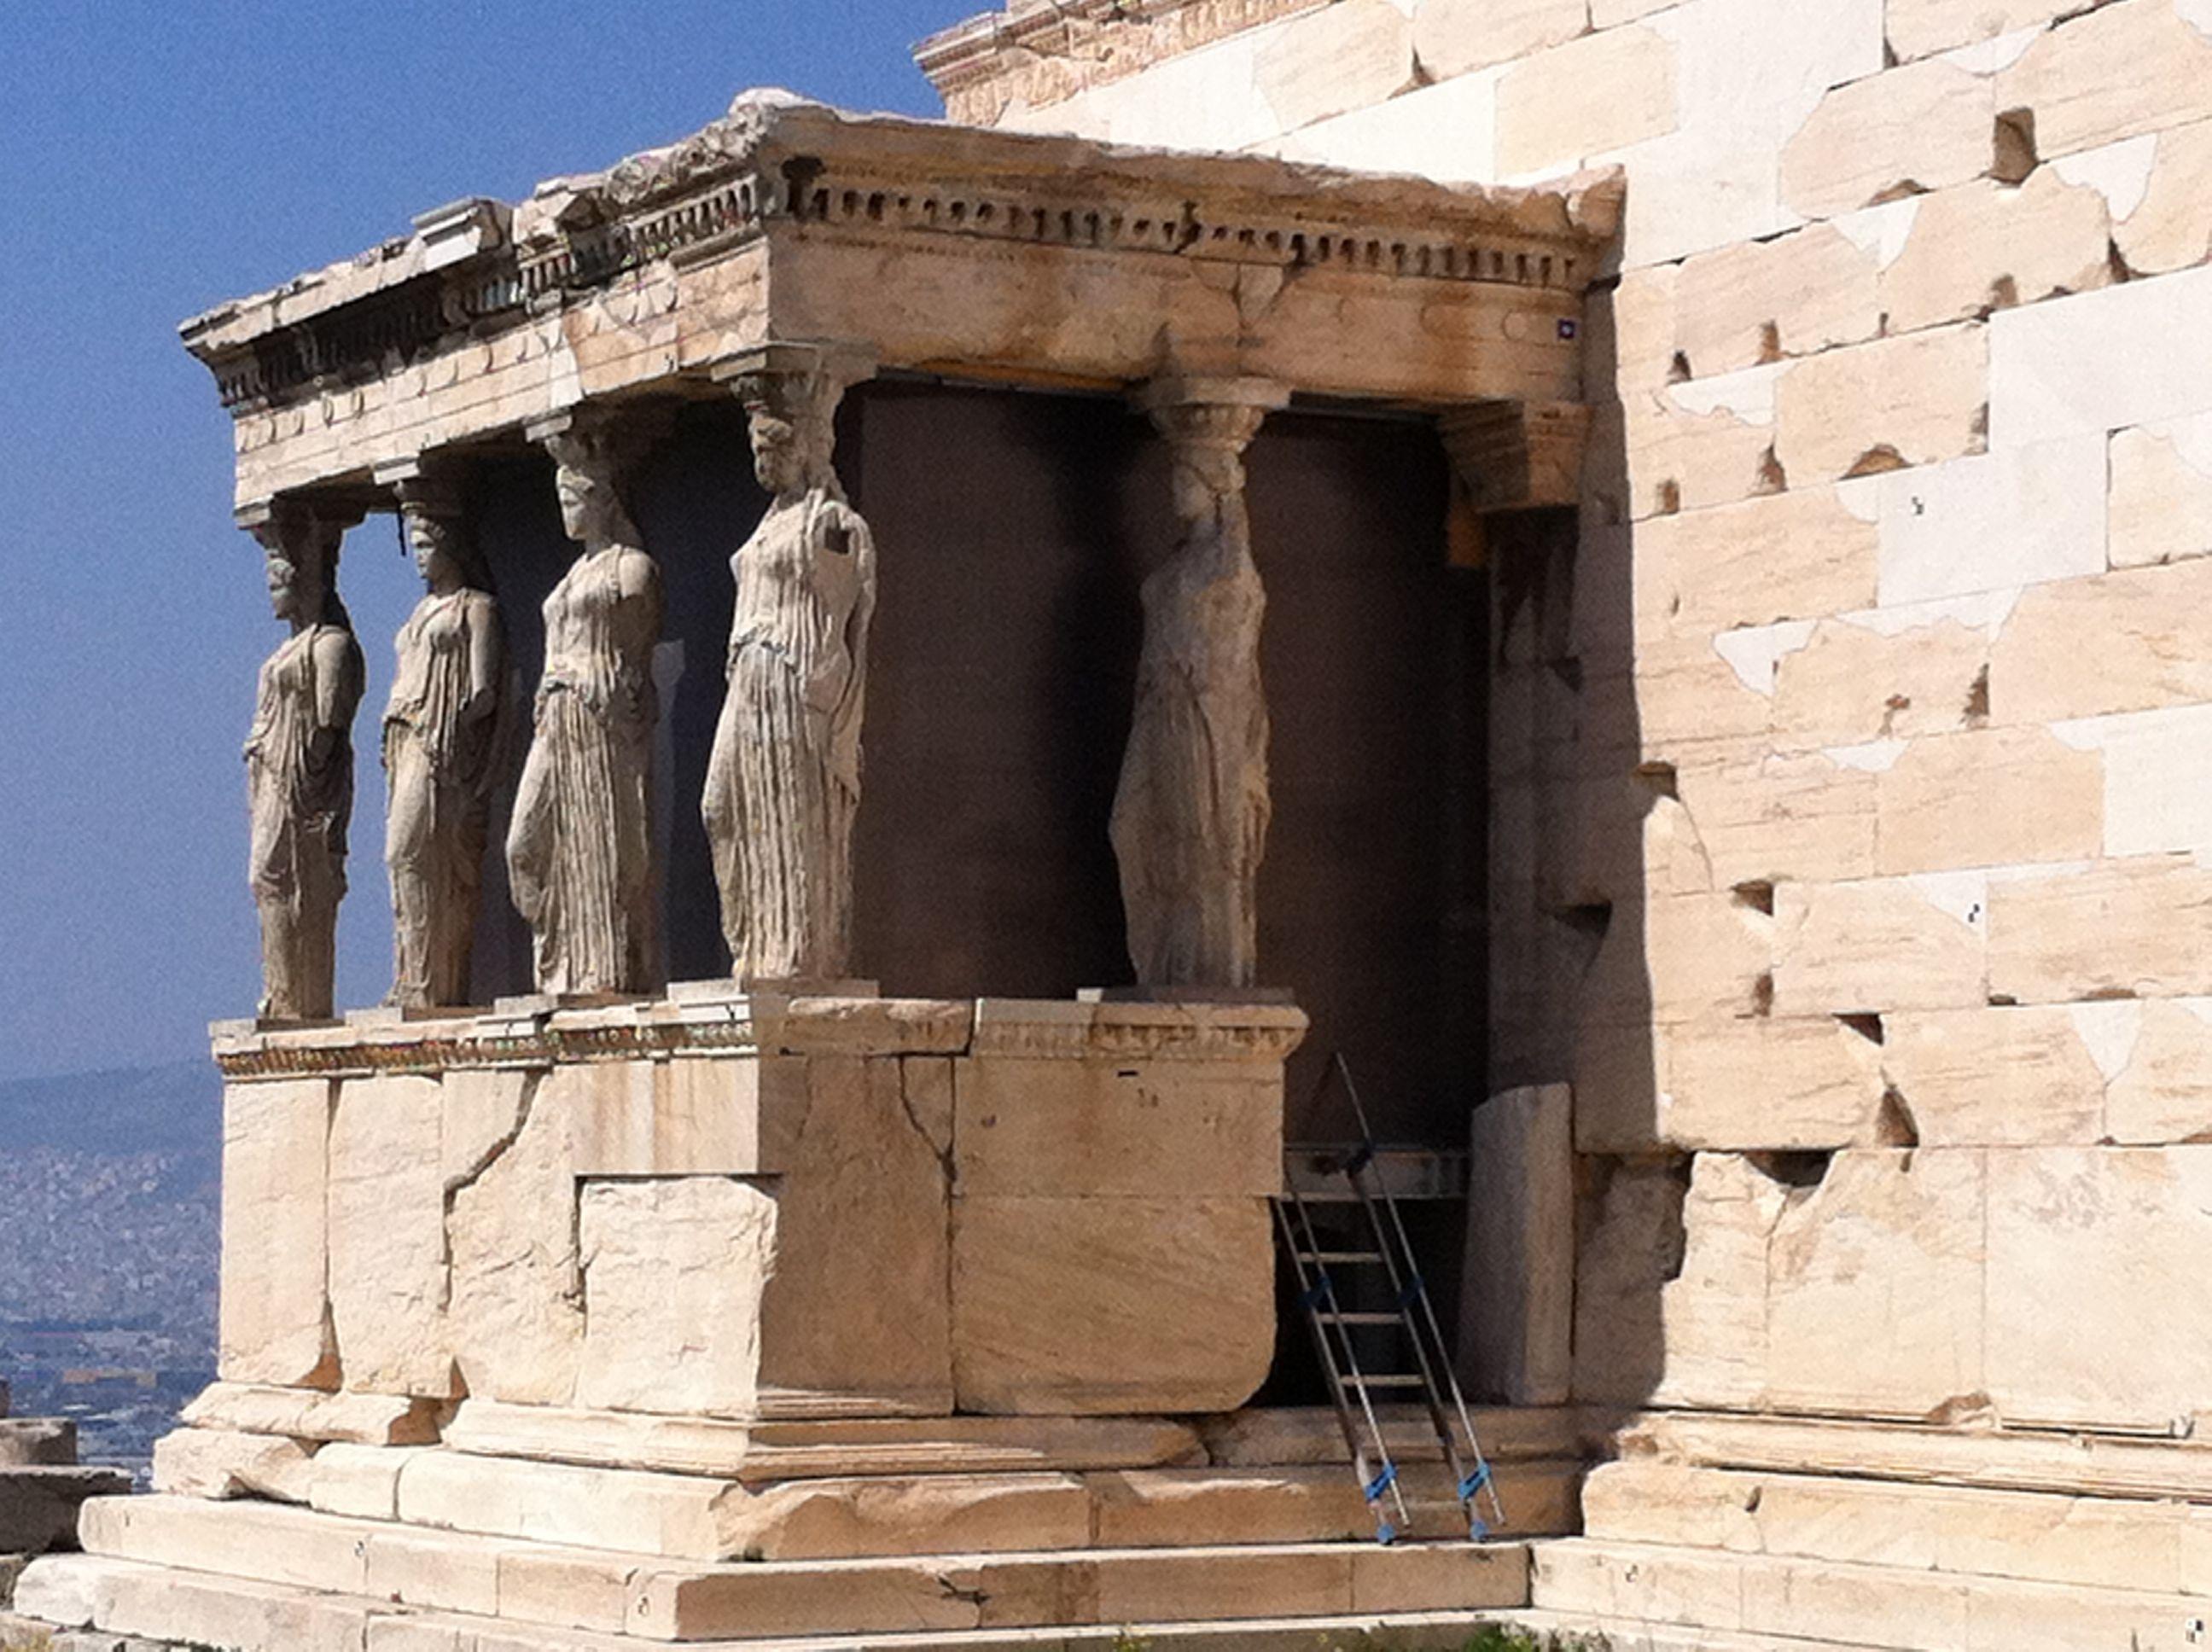 Erecteion (Acrópolis, Atenas, Grecia). #Viajar #viajes #destinos #turismo #atenas #acropolis #partenón #acrópolis #partenon